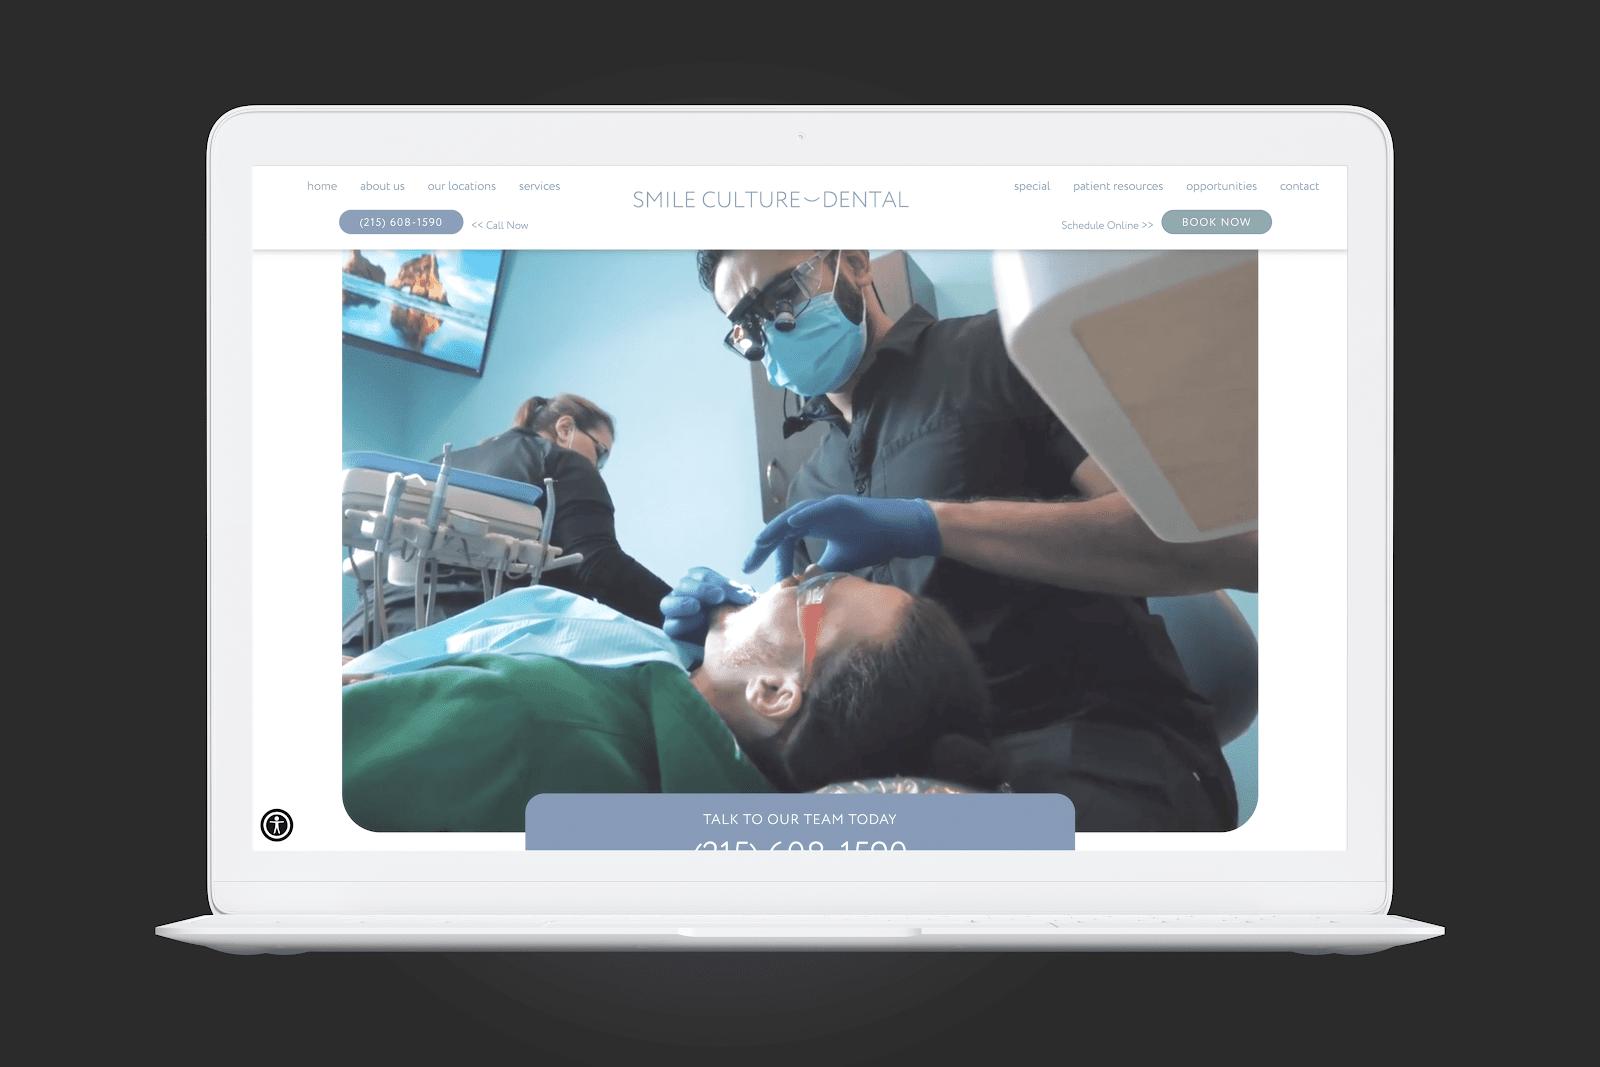 Smile Culture Dental Homepage Screengrab